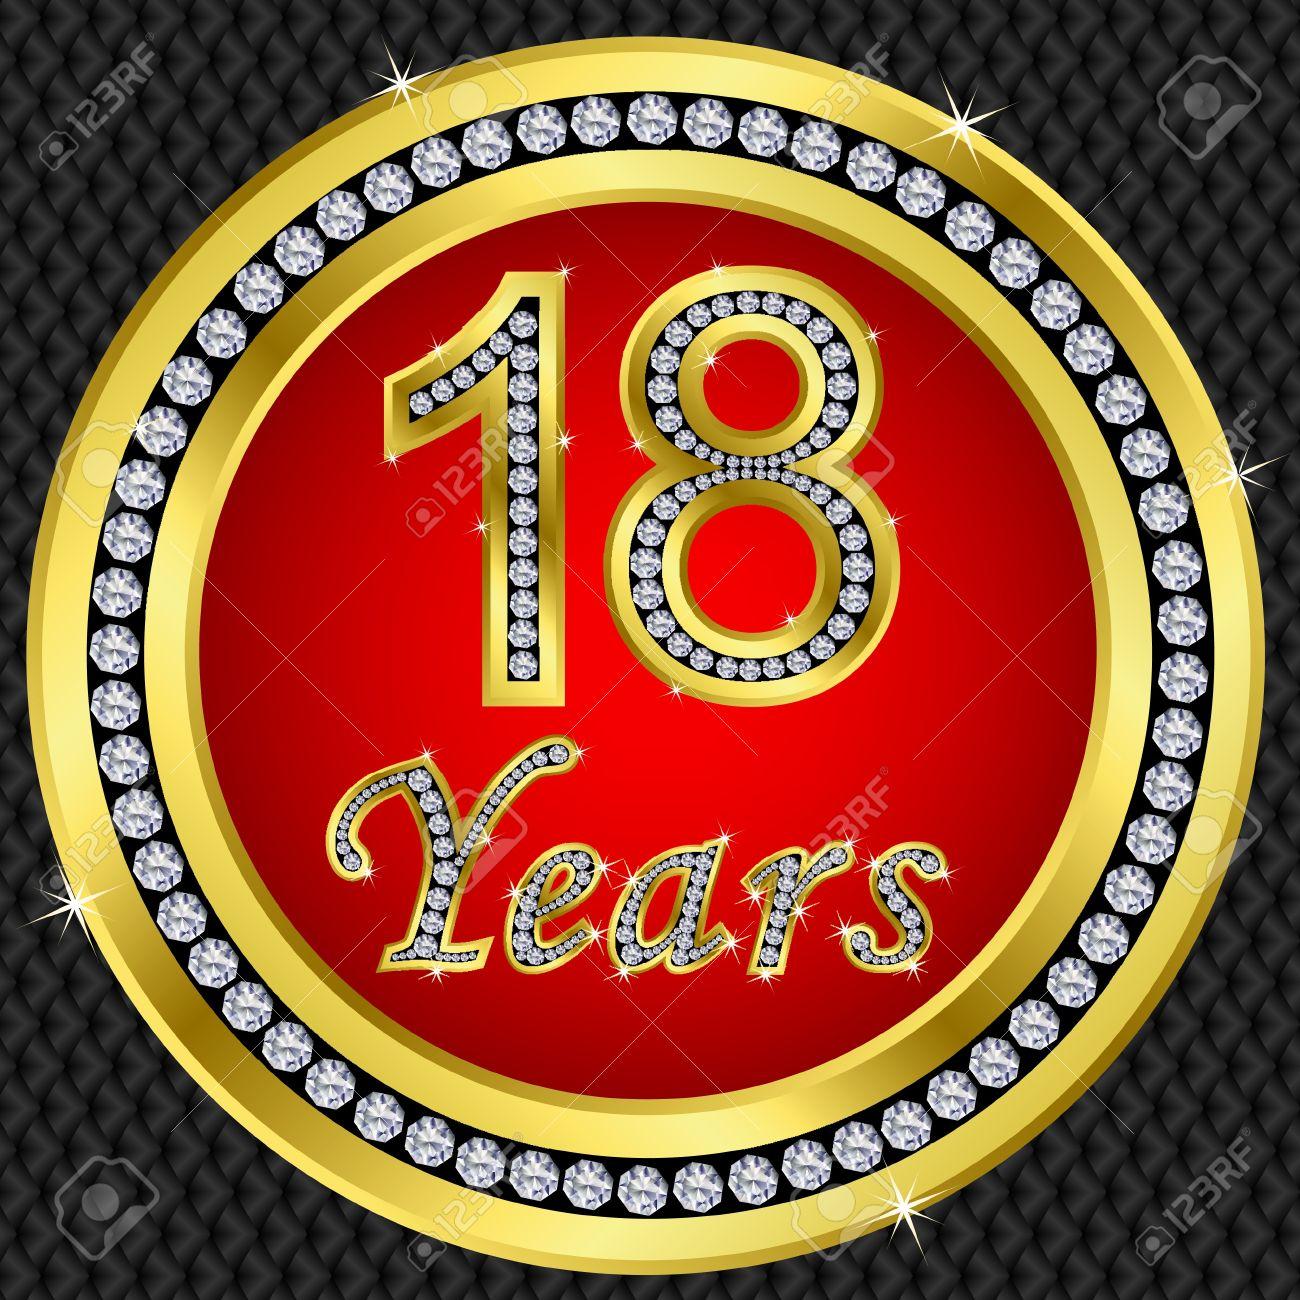 18 years anniversary golden happy birthday icon with diamonds, vector illustration Stock Vector - 11860293